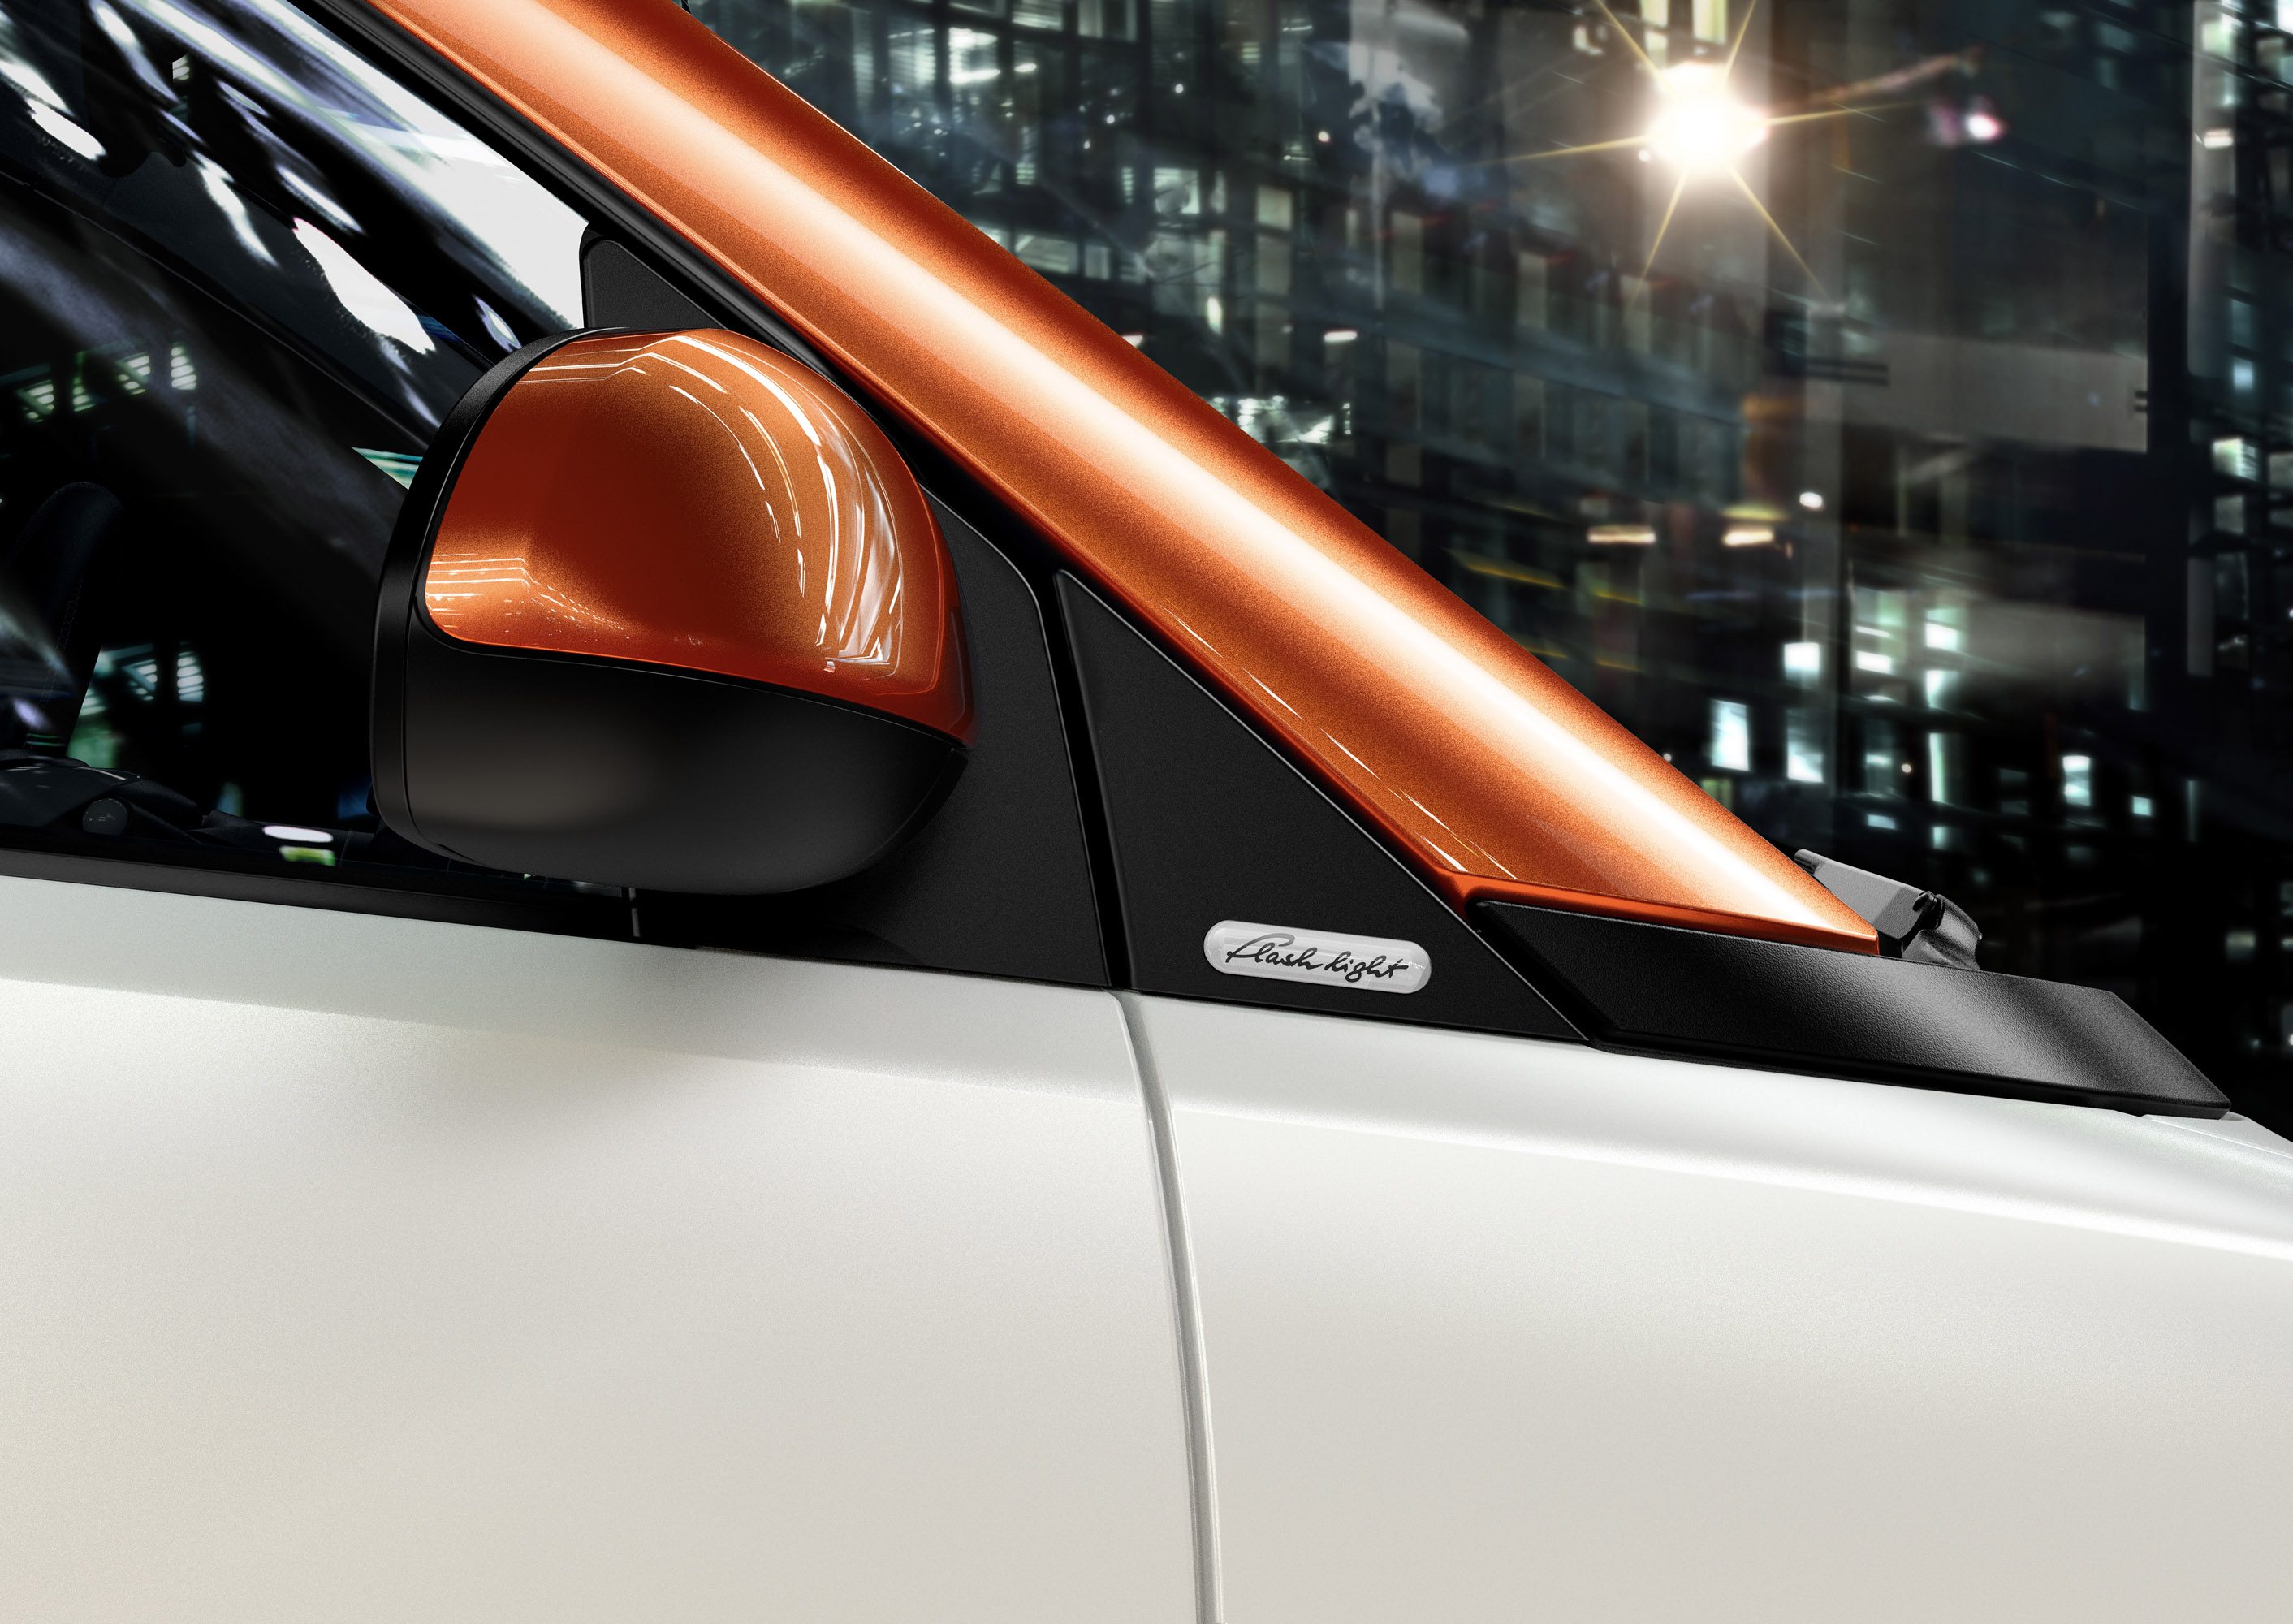 Smart Fortwo edition flashlight cabrio - громкое имя для малогабаритной машины